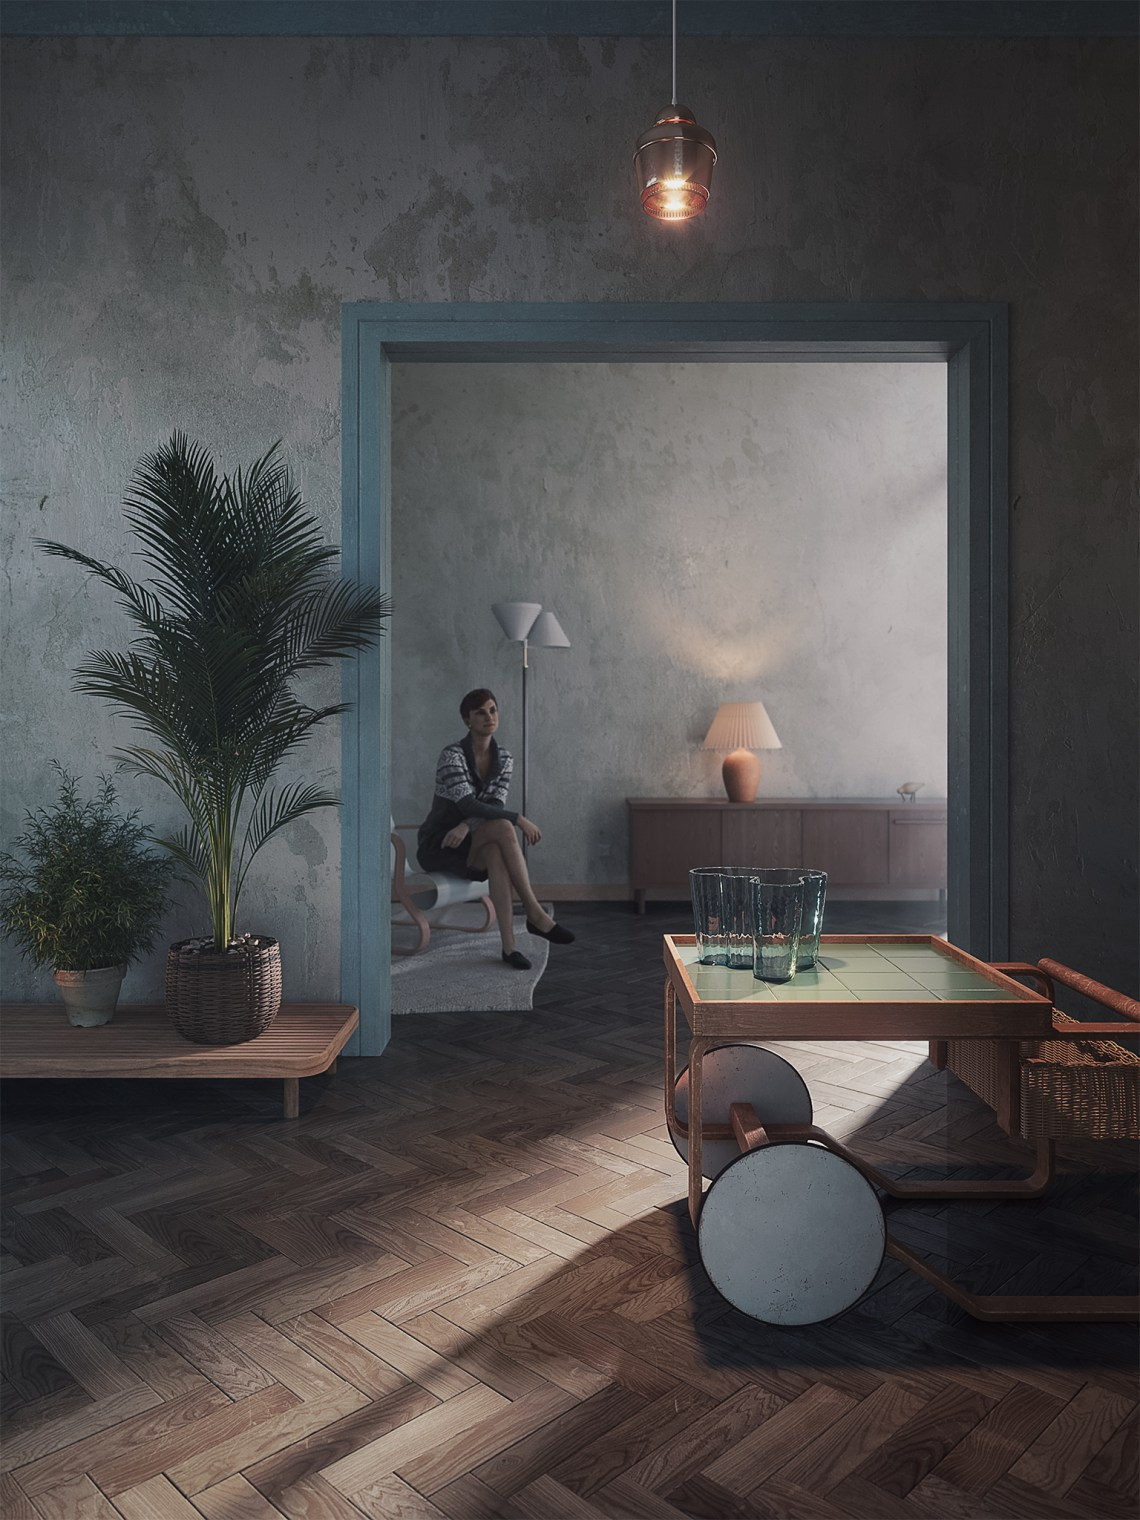 Pandora's vase - rendering Donato Locantore